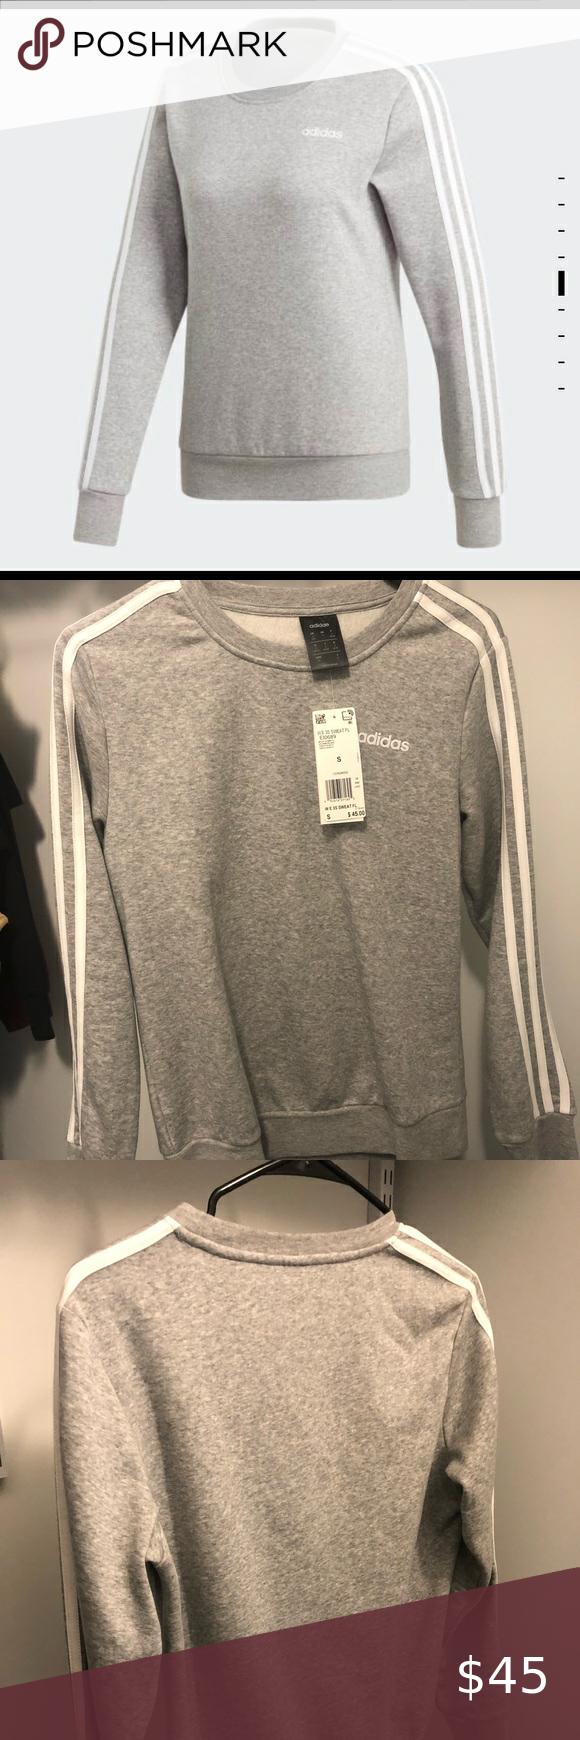 Predownload: Adidas Essentials 3 Stripes Sweatshirt Grey Brand New Adidas Ribbed Crewneck Three White Stripes On Both Arm Striped Sweatshirts Grey Sweatshirt Sweatshirts [ 1740 x 580 Pixel ]